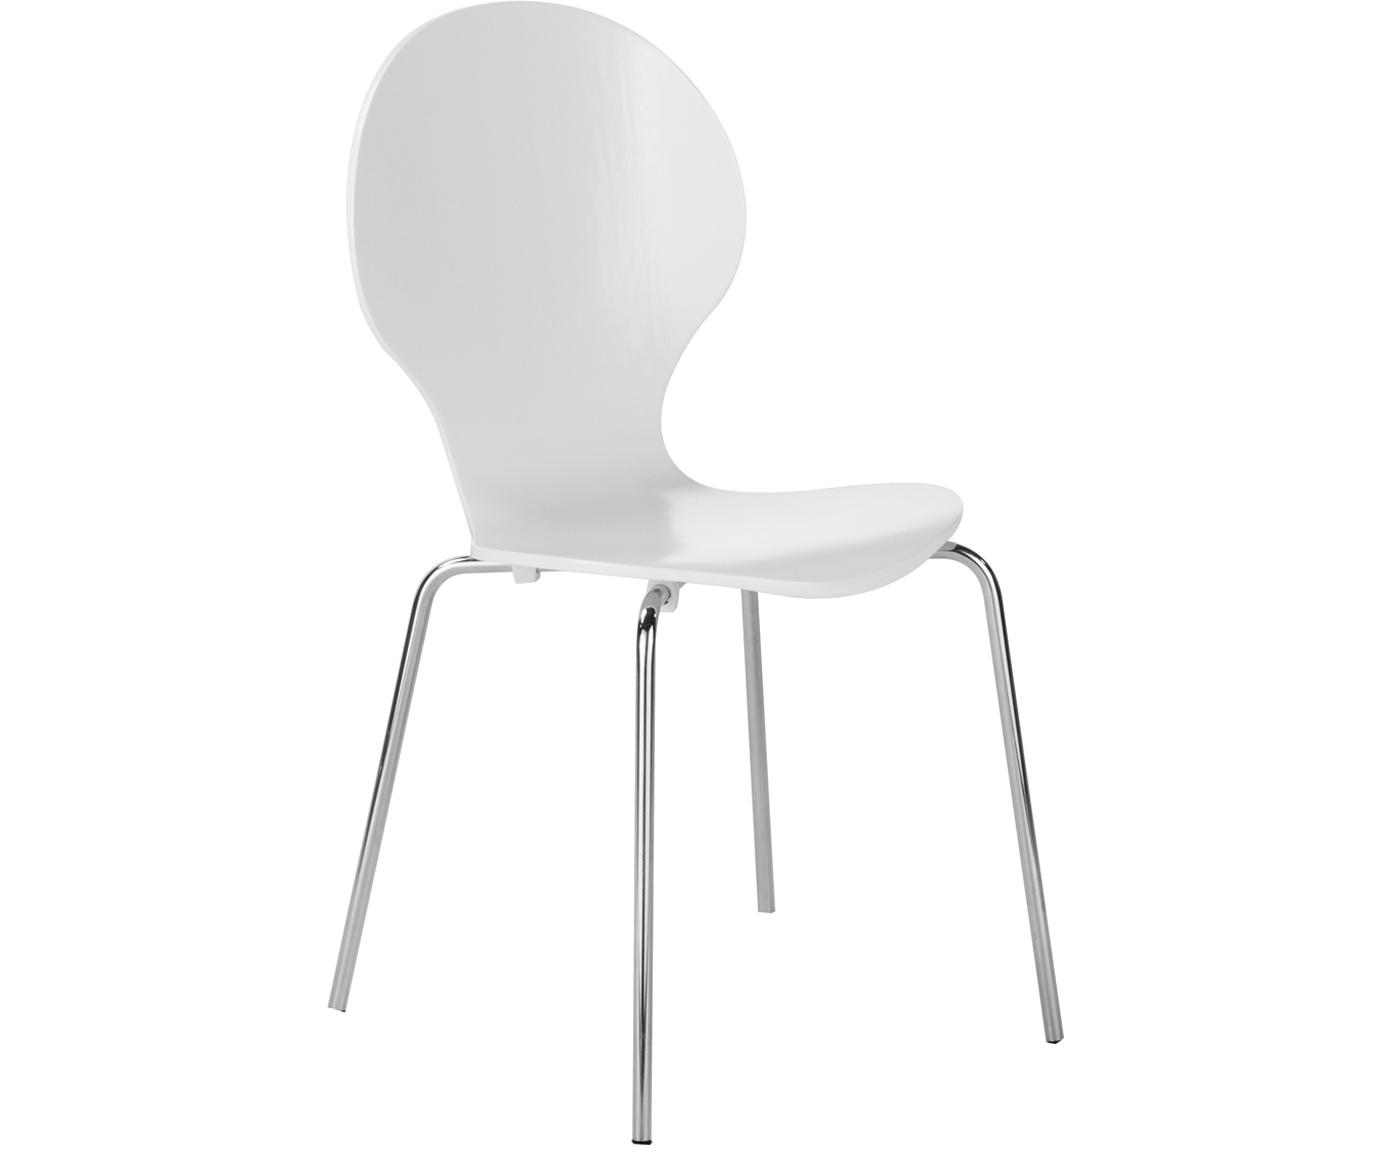 Sedie Marcus, 4 pz., Seduta: fibra a media densità, Struttura: acciaio cromato, Bianco, L 49 x A 87 cm